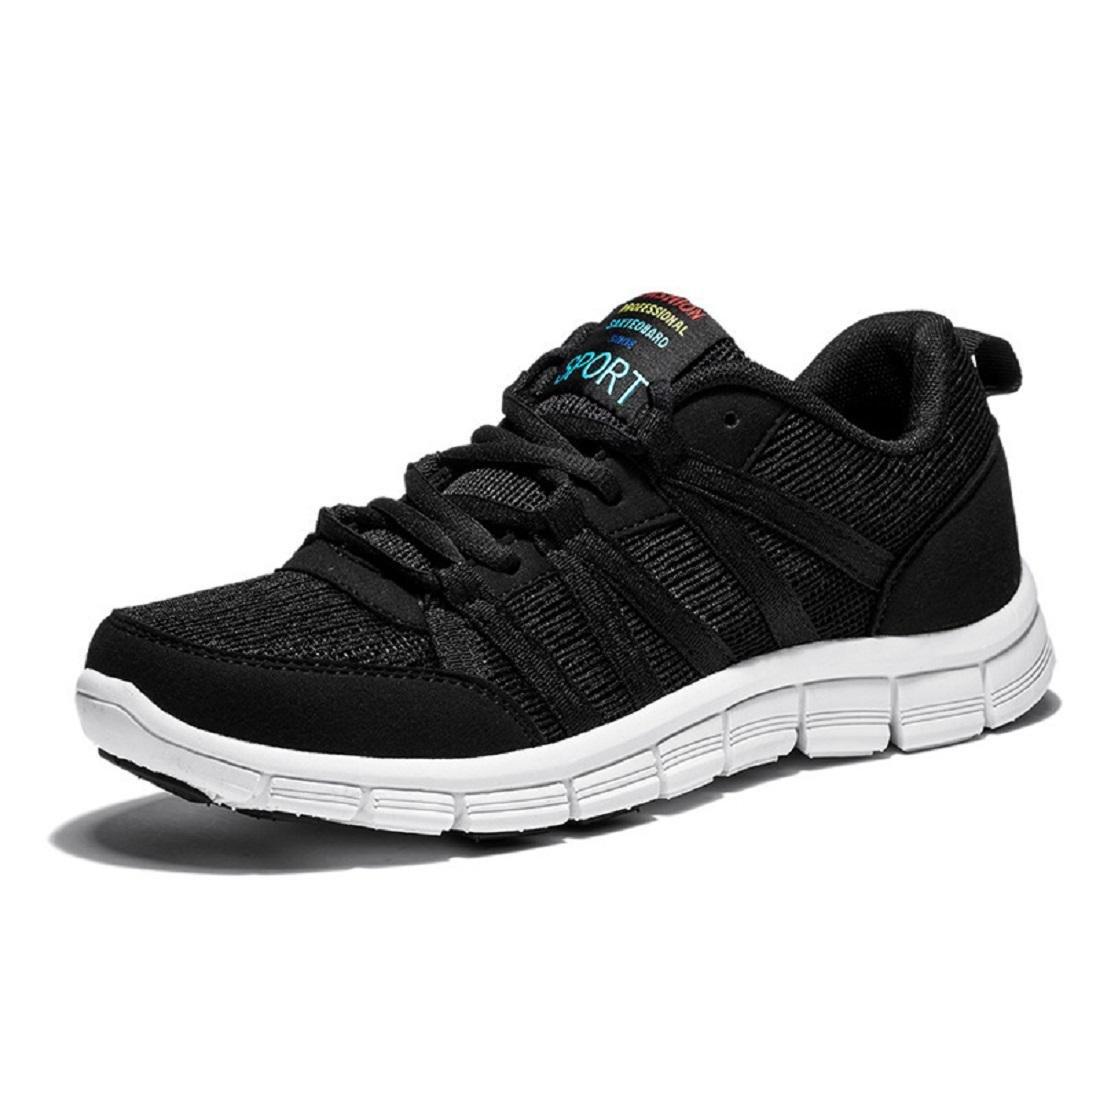 Herren Sportschuhe Atmungsaktiv Lässige Schuhe Laufschuhe Rutschfest Ausbilder Draussen Mode Freizeitschuhe EUR GRÖSSE 39-44